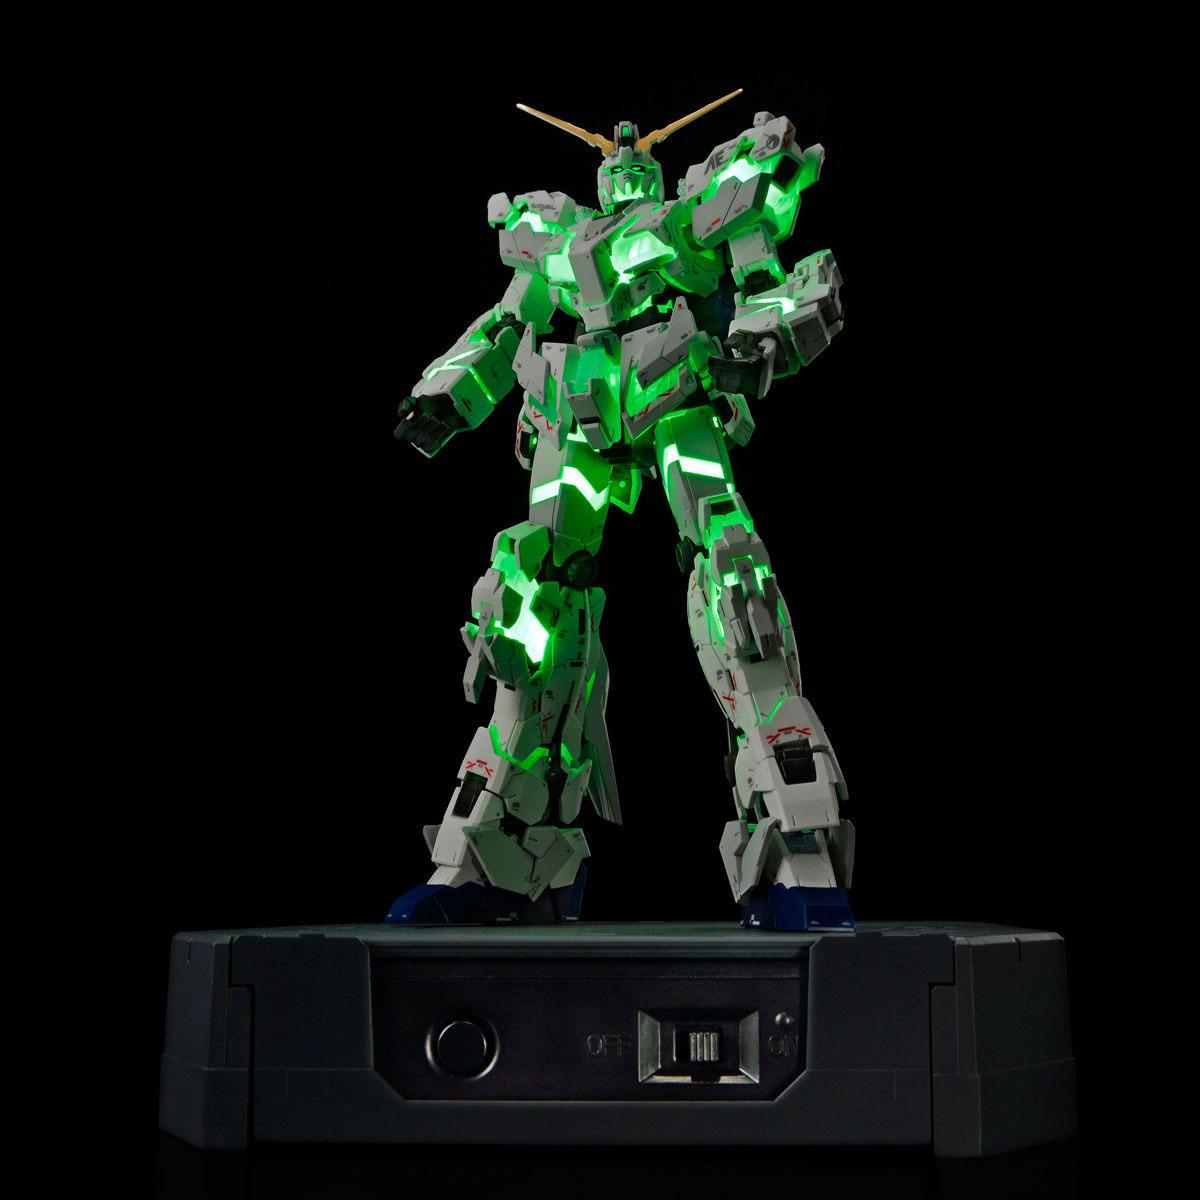 RG 1/144『ガンダムベース限定 RX-0 ユニコーンガンダム(デストロイモード)Ver.TWC(LIGHTING MODEL)』プラモデル-006